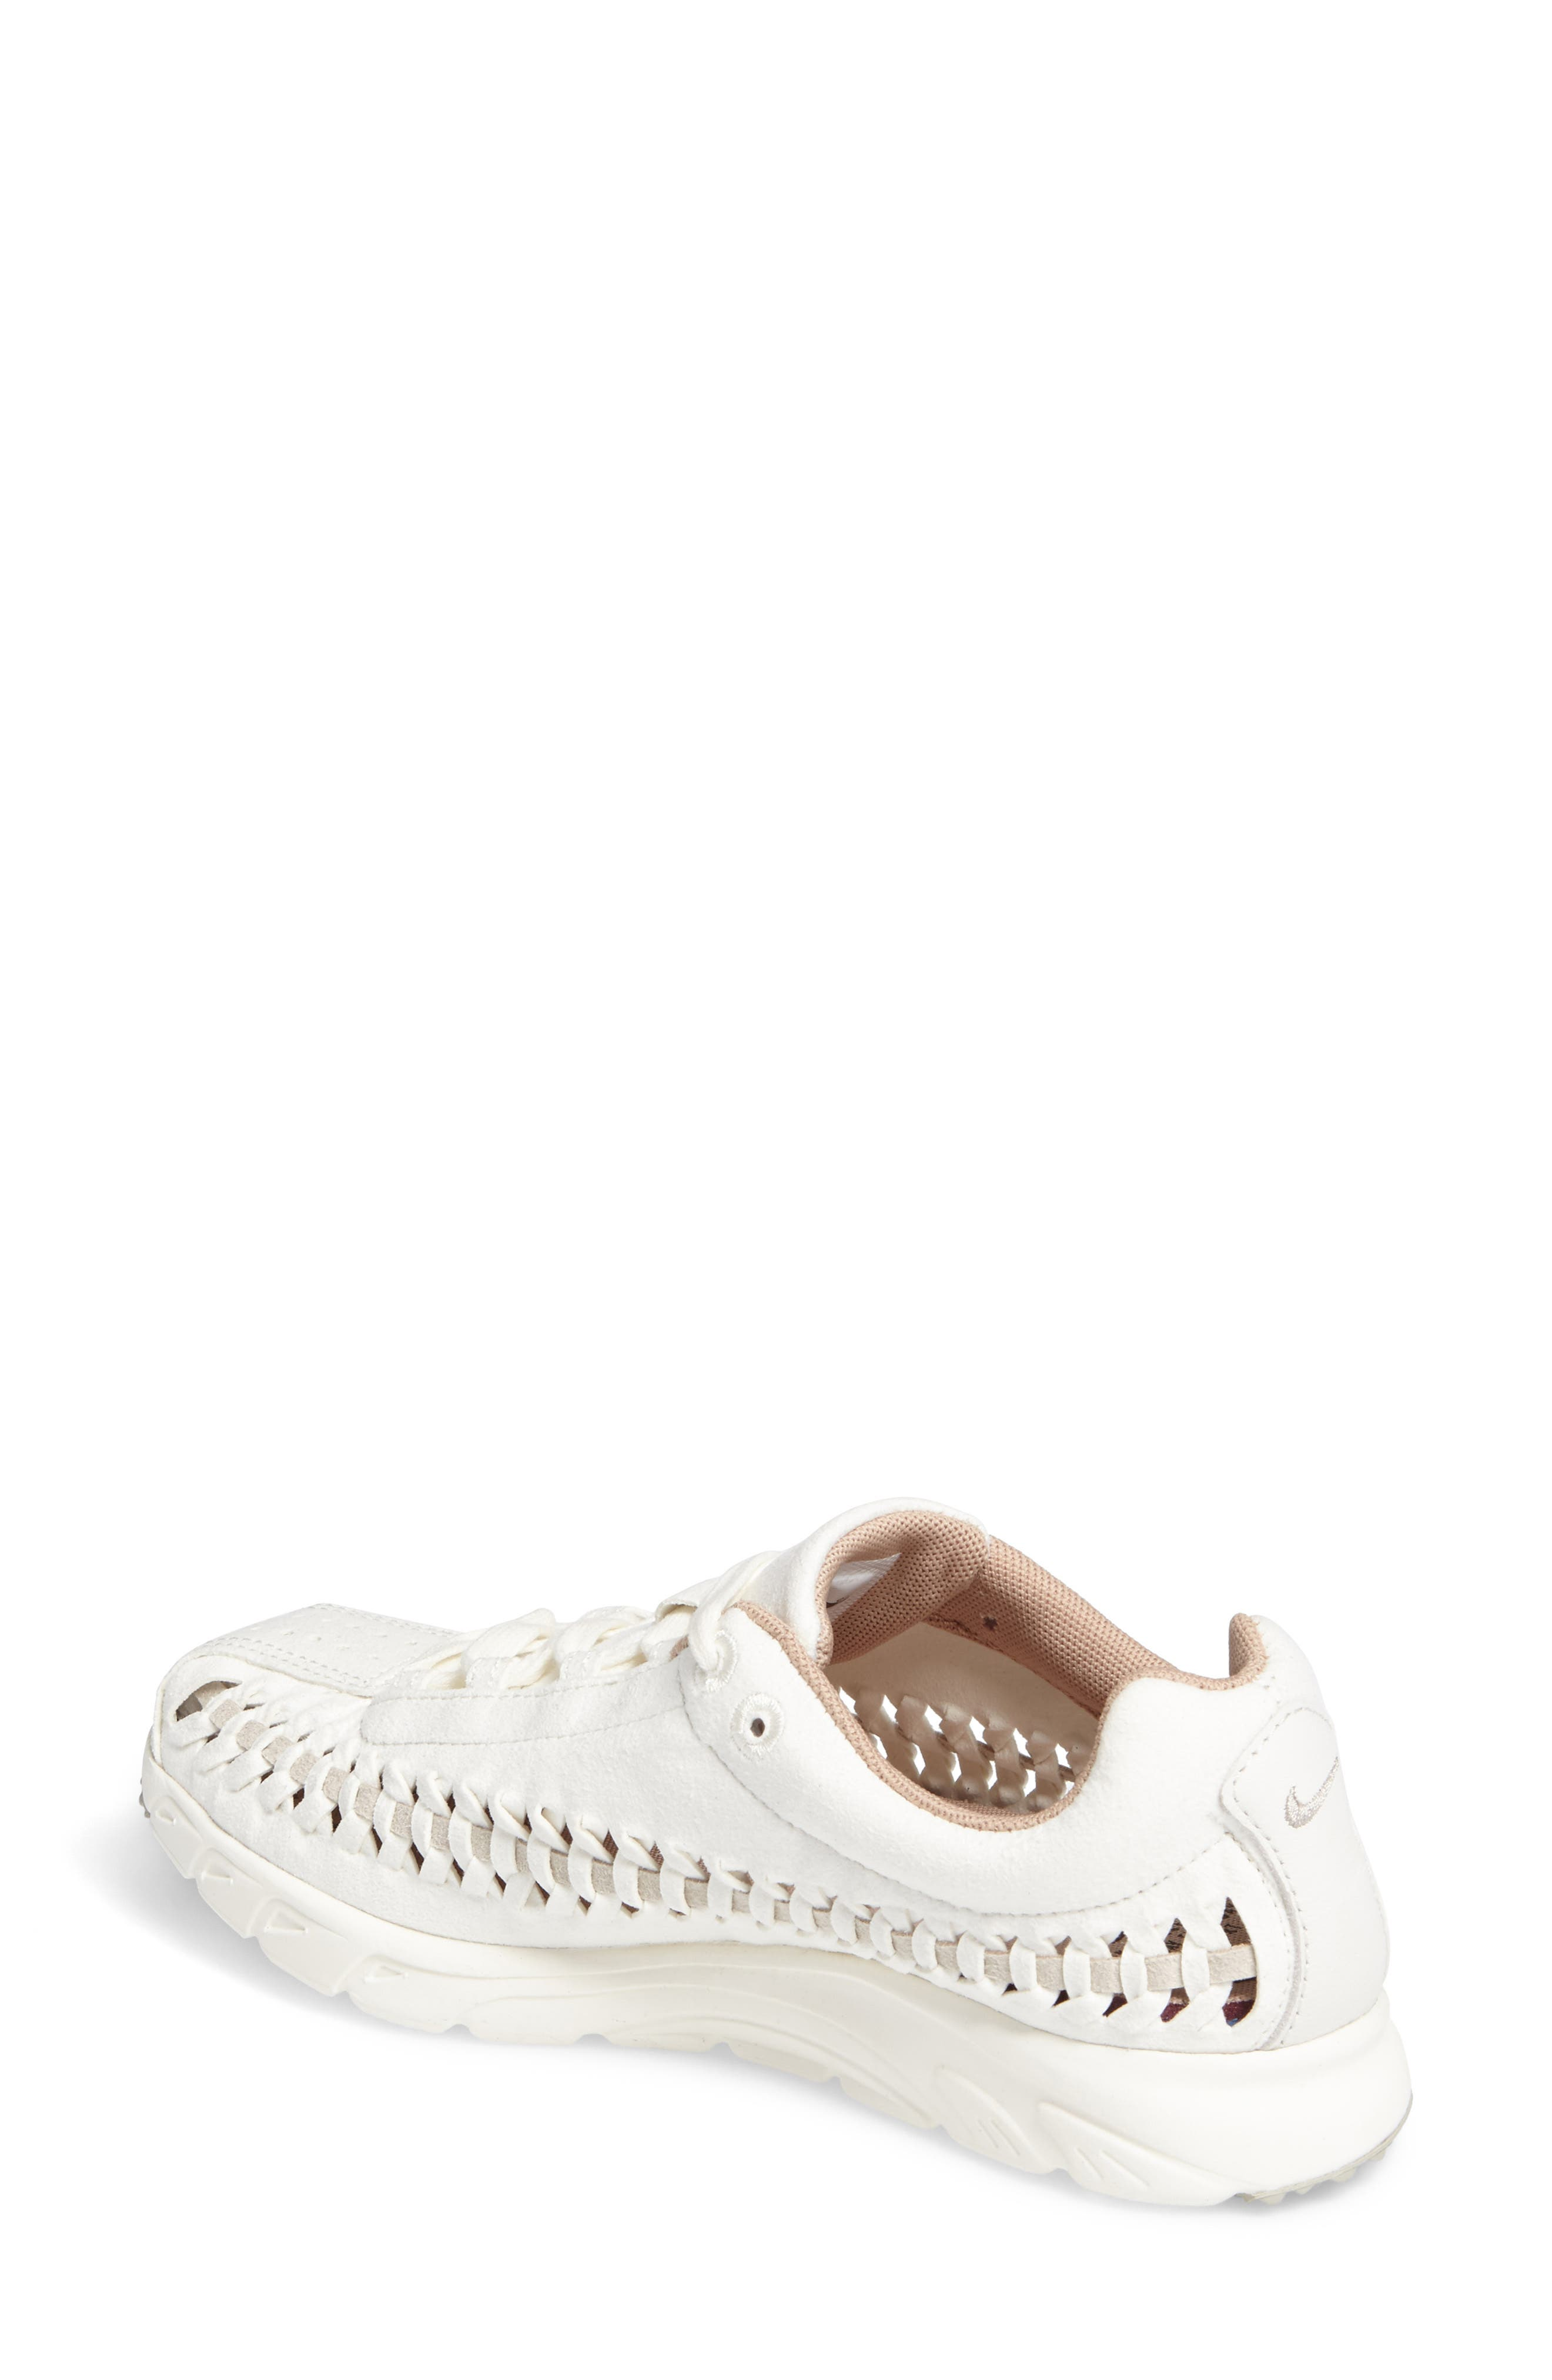 'Mayfly Woven' Sneaker,                             Alternate thumbnail 2, color,                             Sail/ Pale Grey/ Elm/ Sail